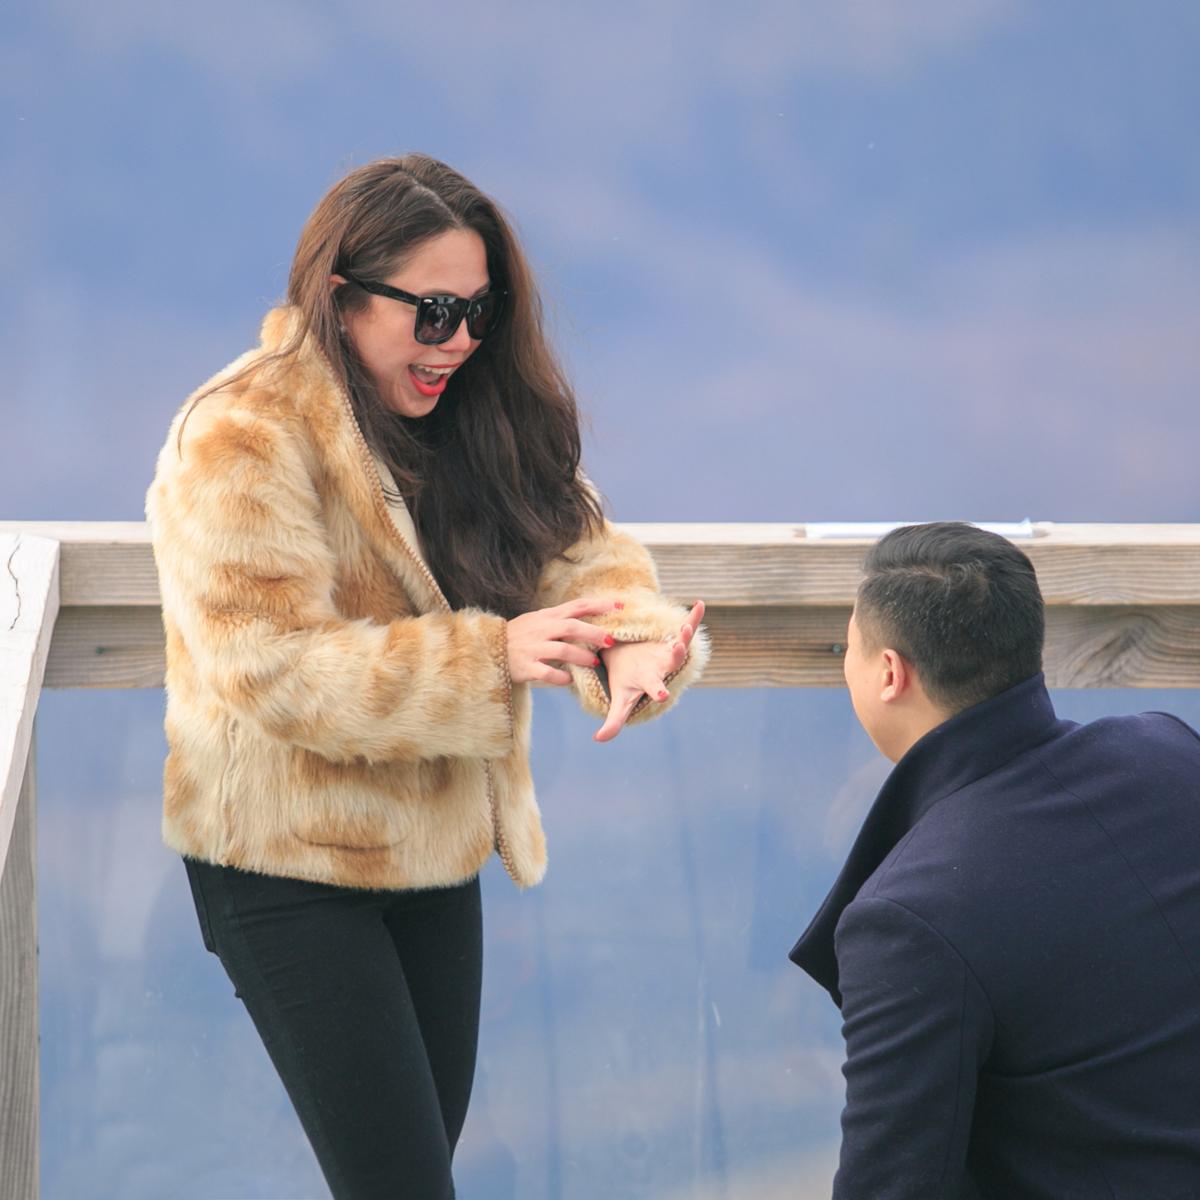 wedding-proposal-sea-to-sky-squamish-girl-surprised.jpg